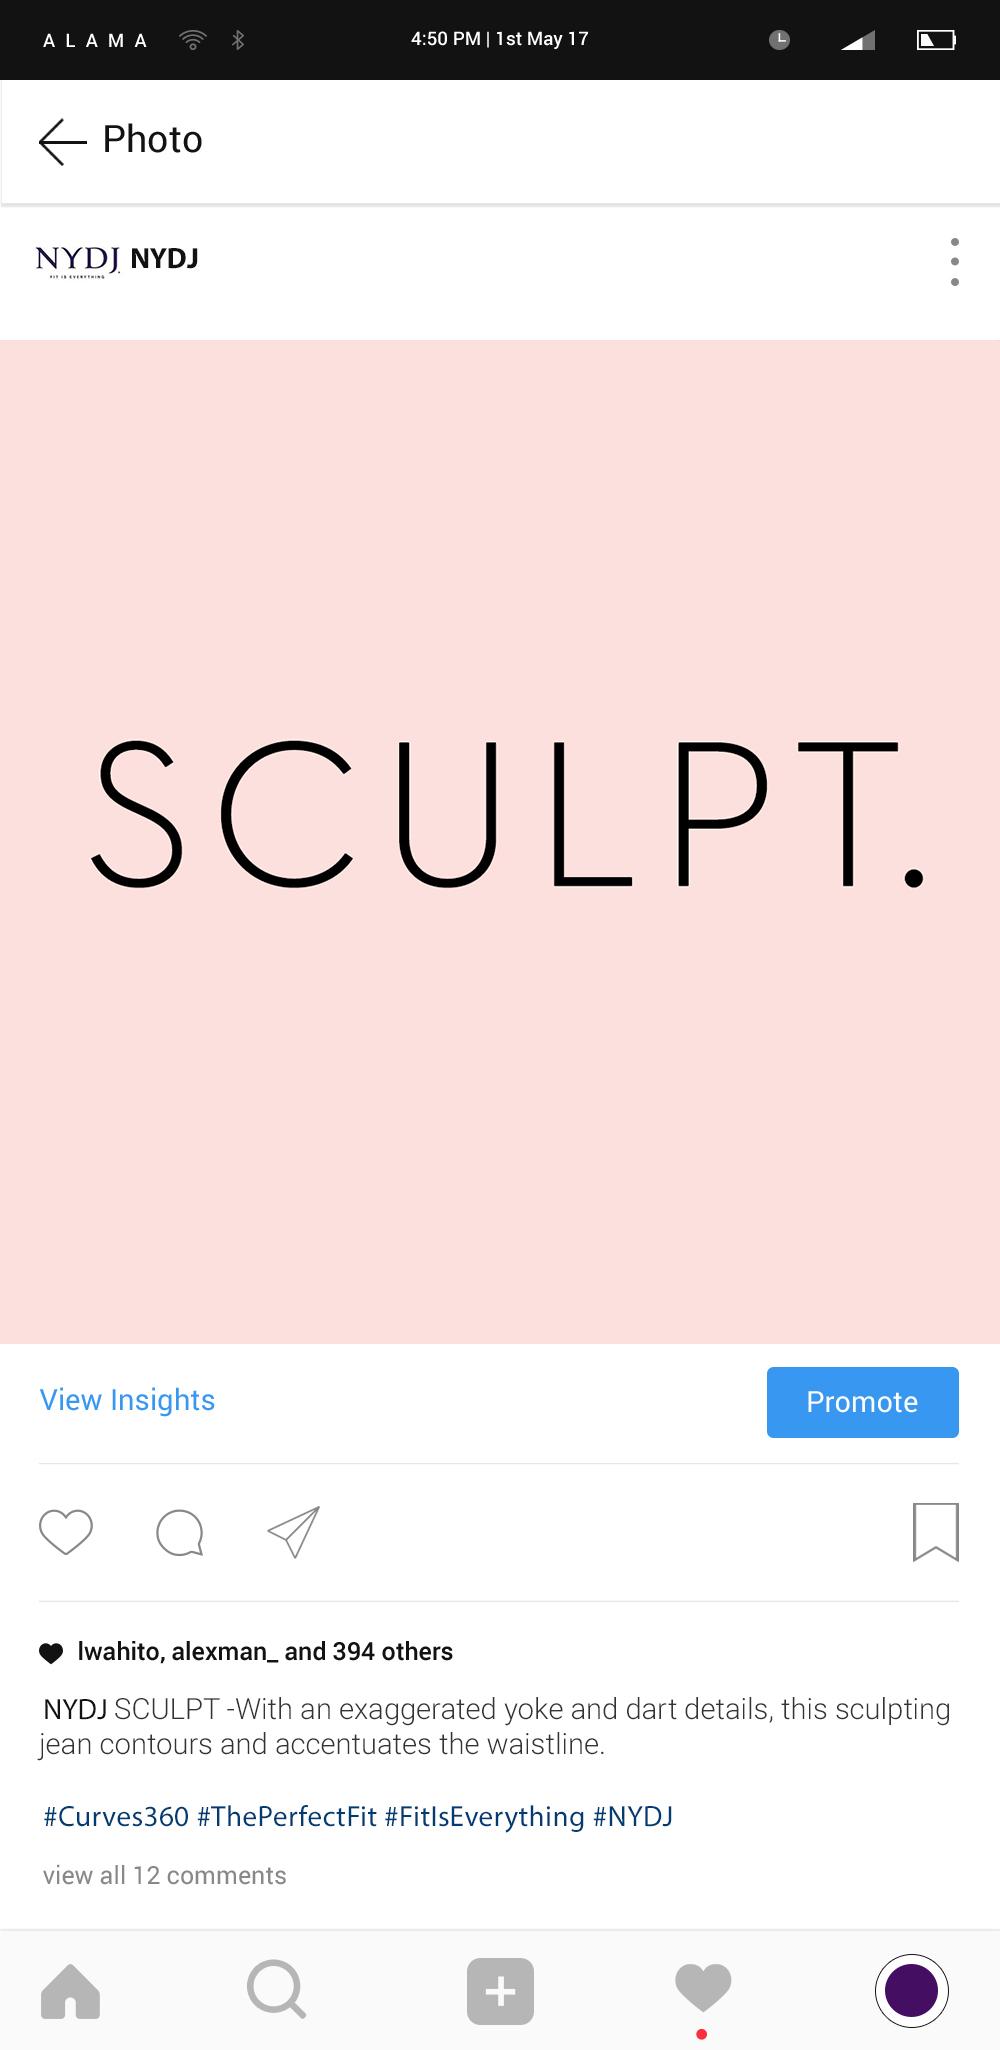 IG Mockup - Sculpt.jpg